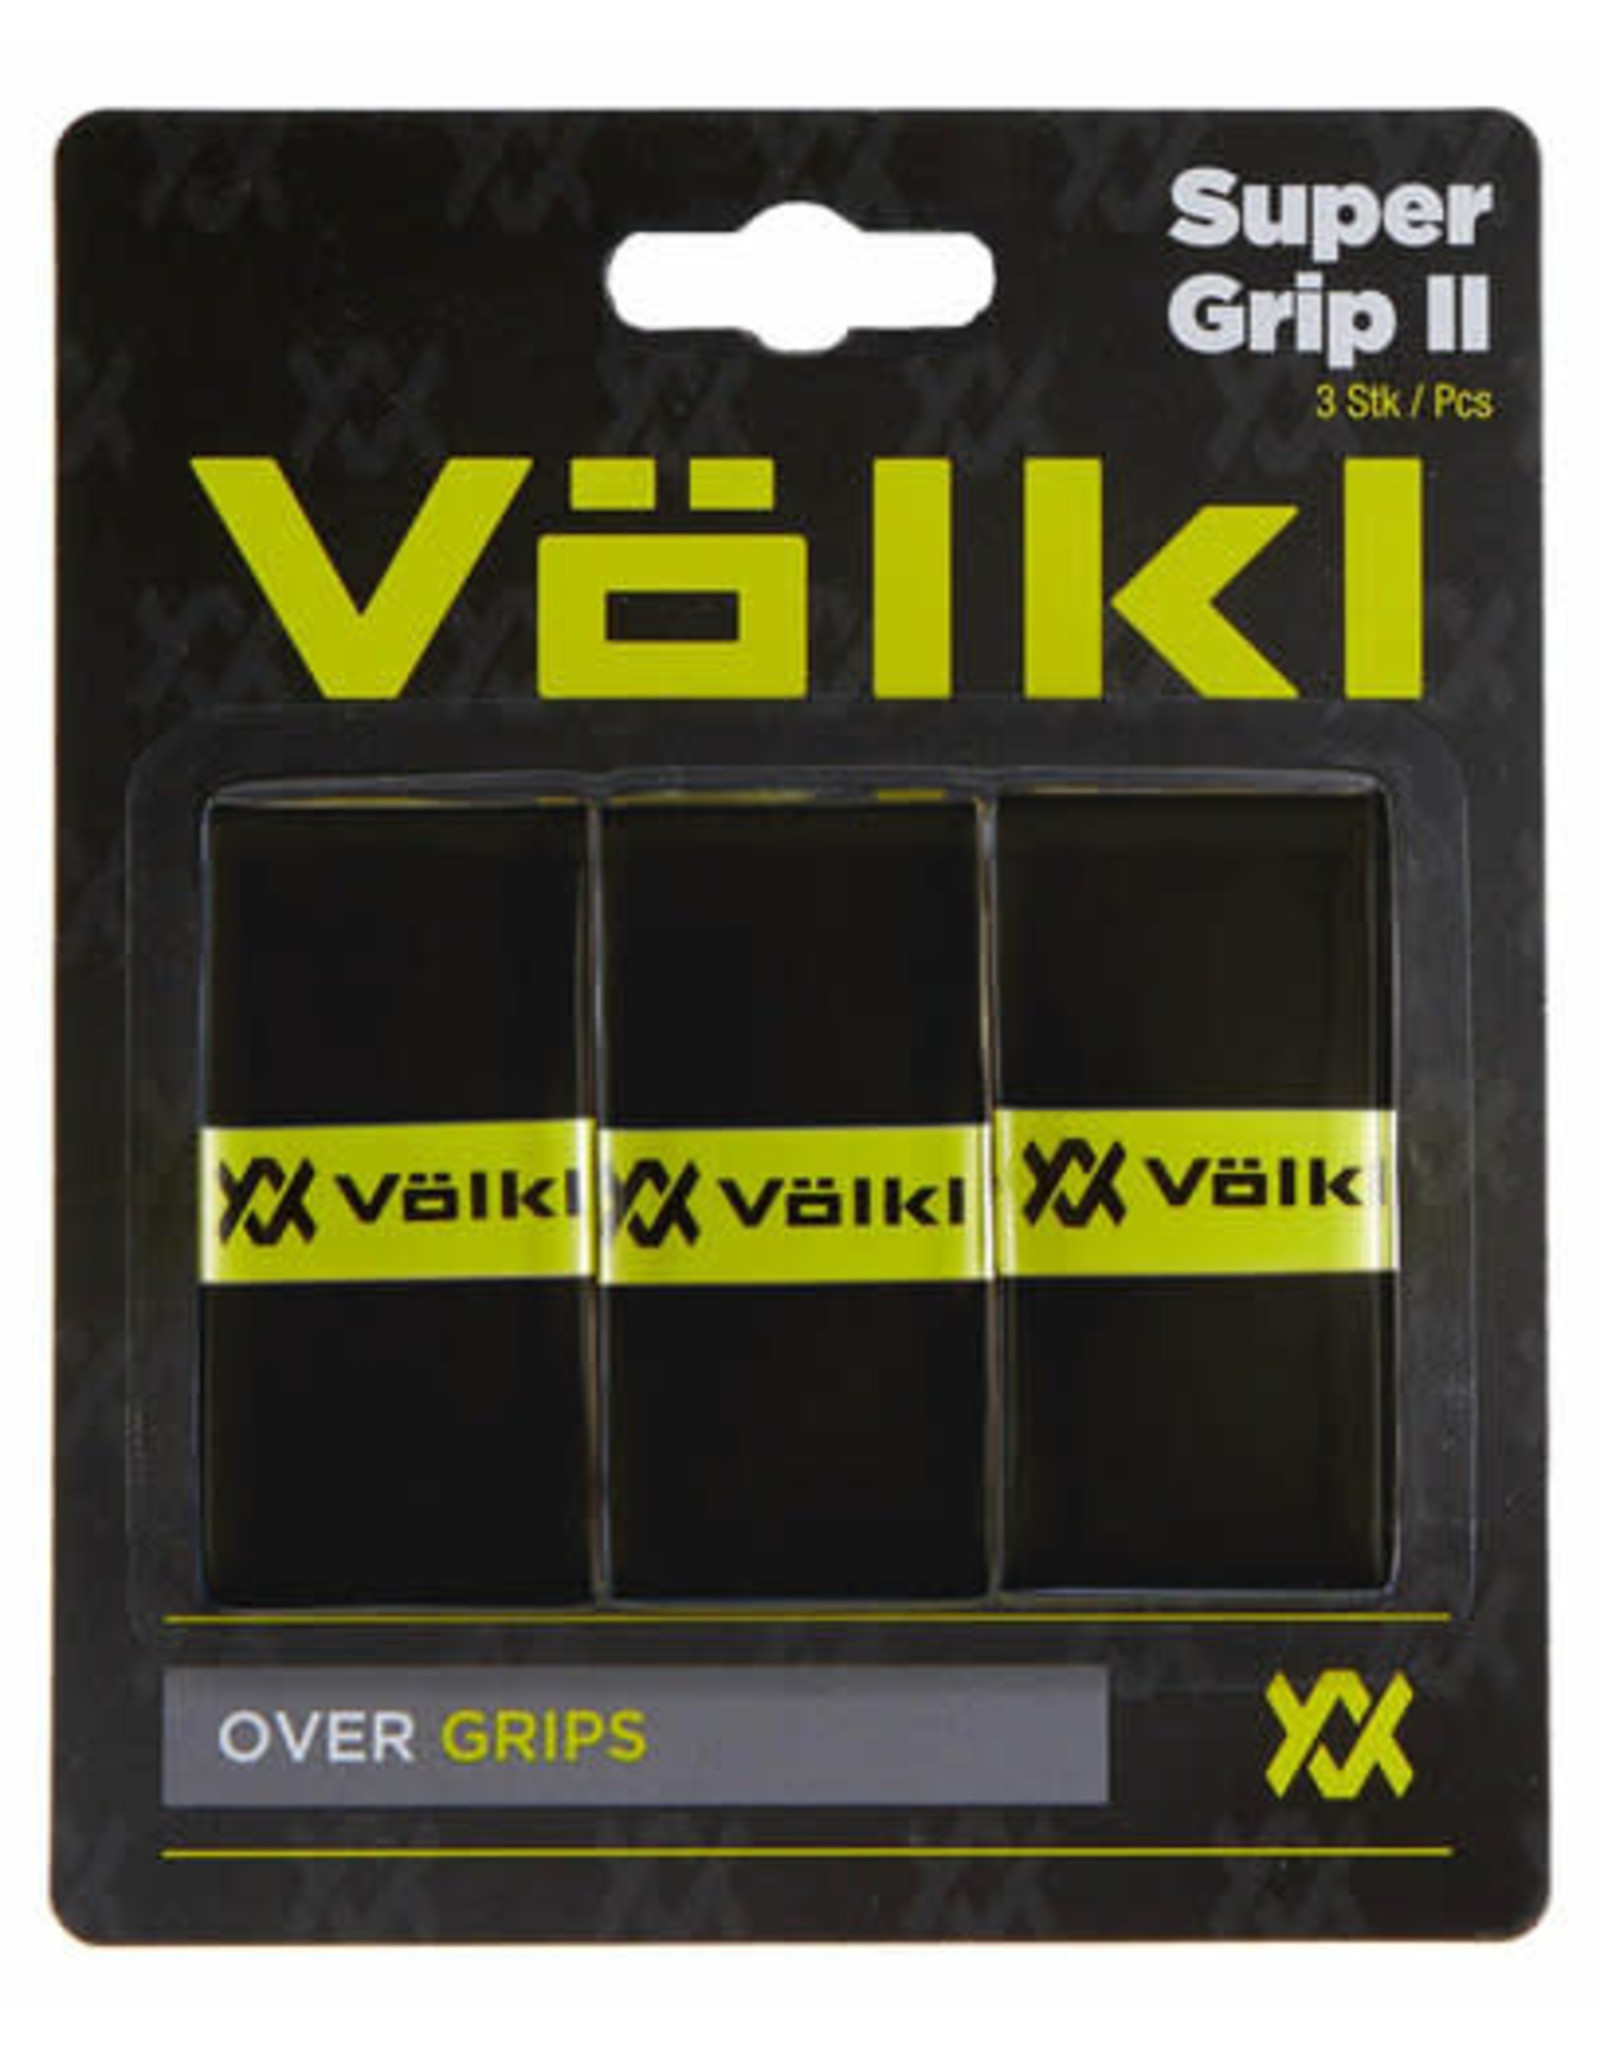 Volkl Super Grip II (3 pack) Black